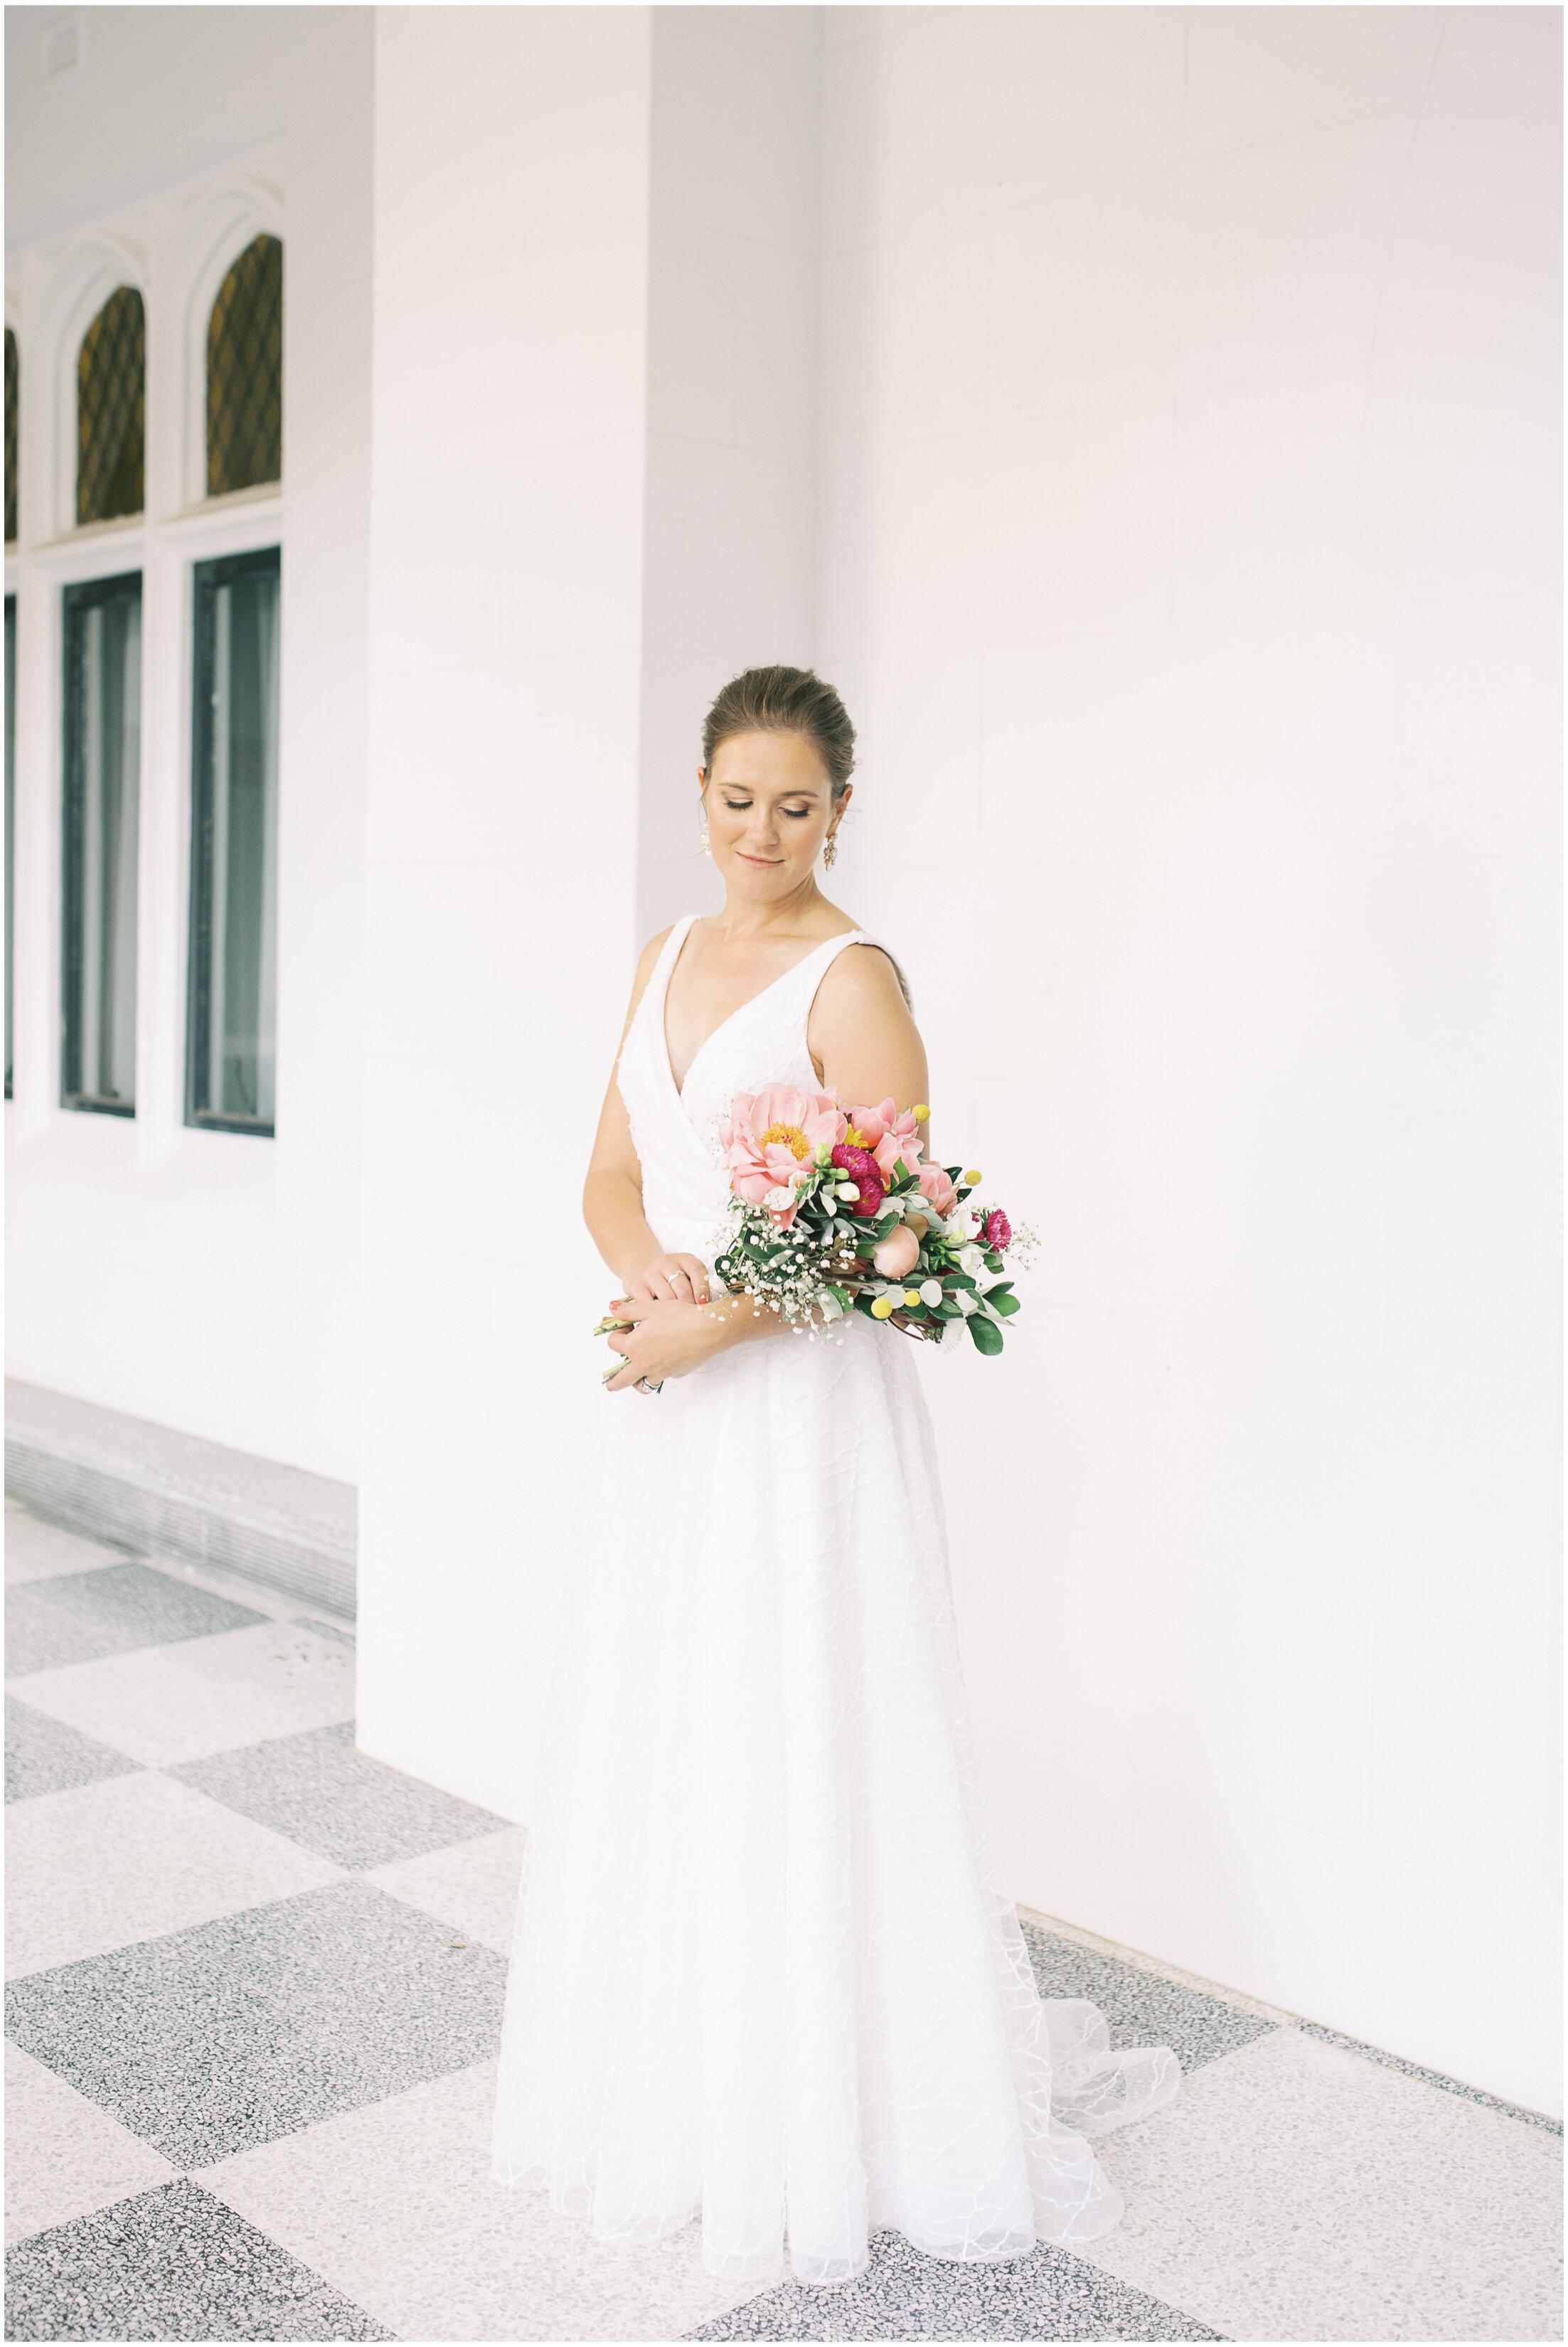 refinery-brisbane-wedding-photography-film-photographer-fine-art-35.jpg